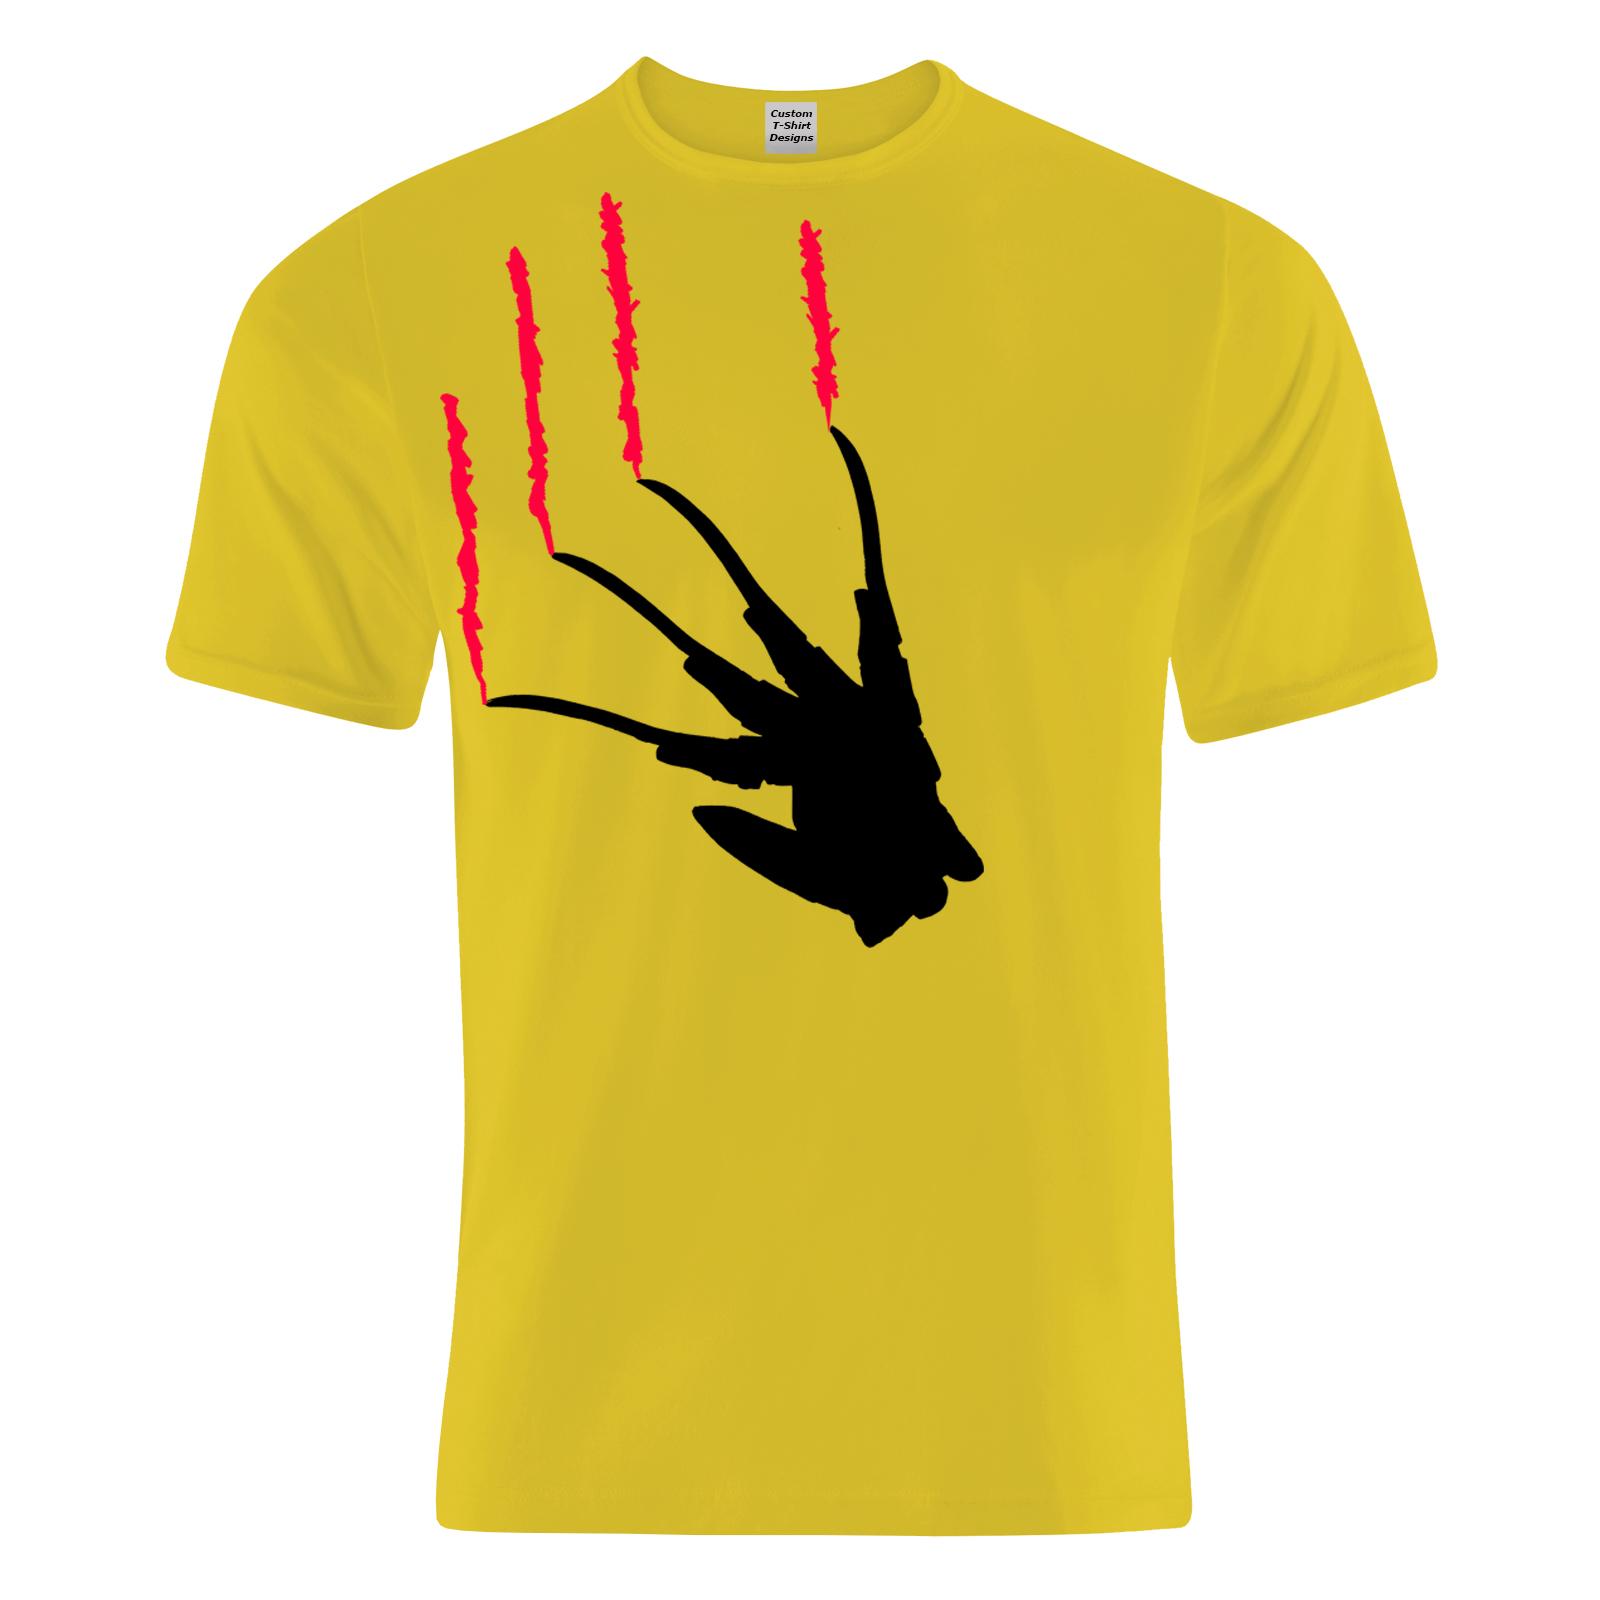 1600x1600 Freddy Glove Silhouette Elm Street Cotton T Shirt